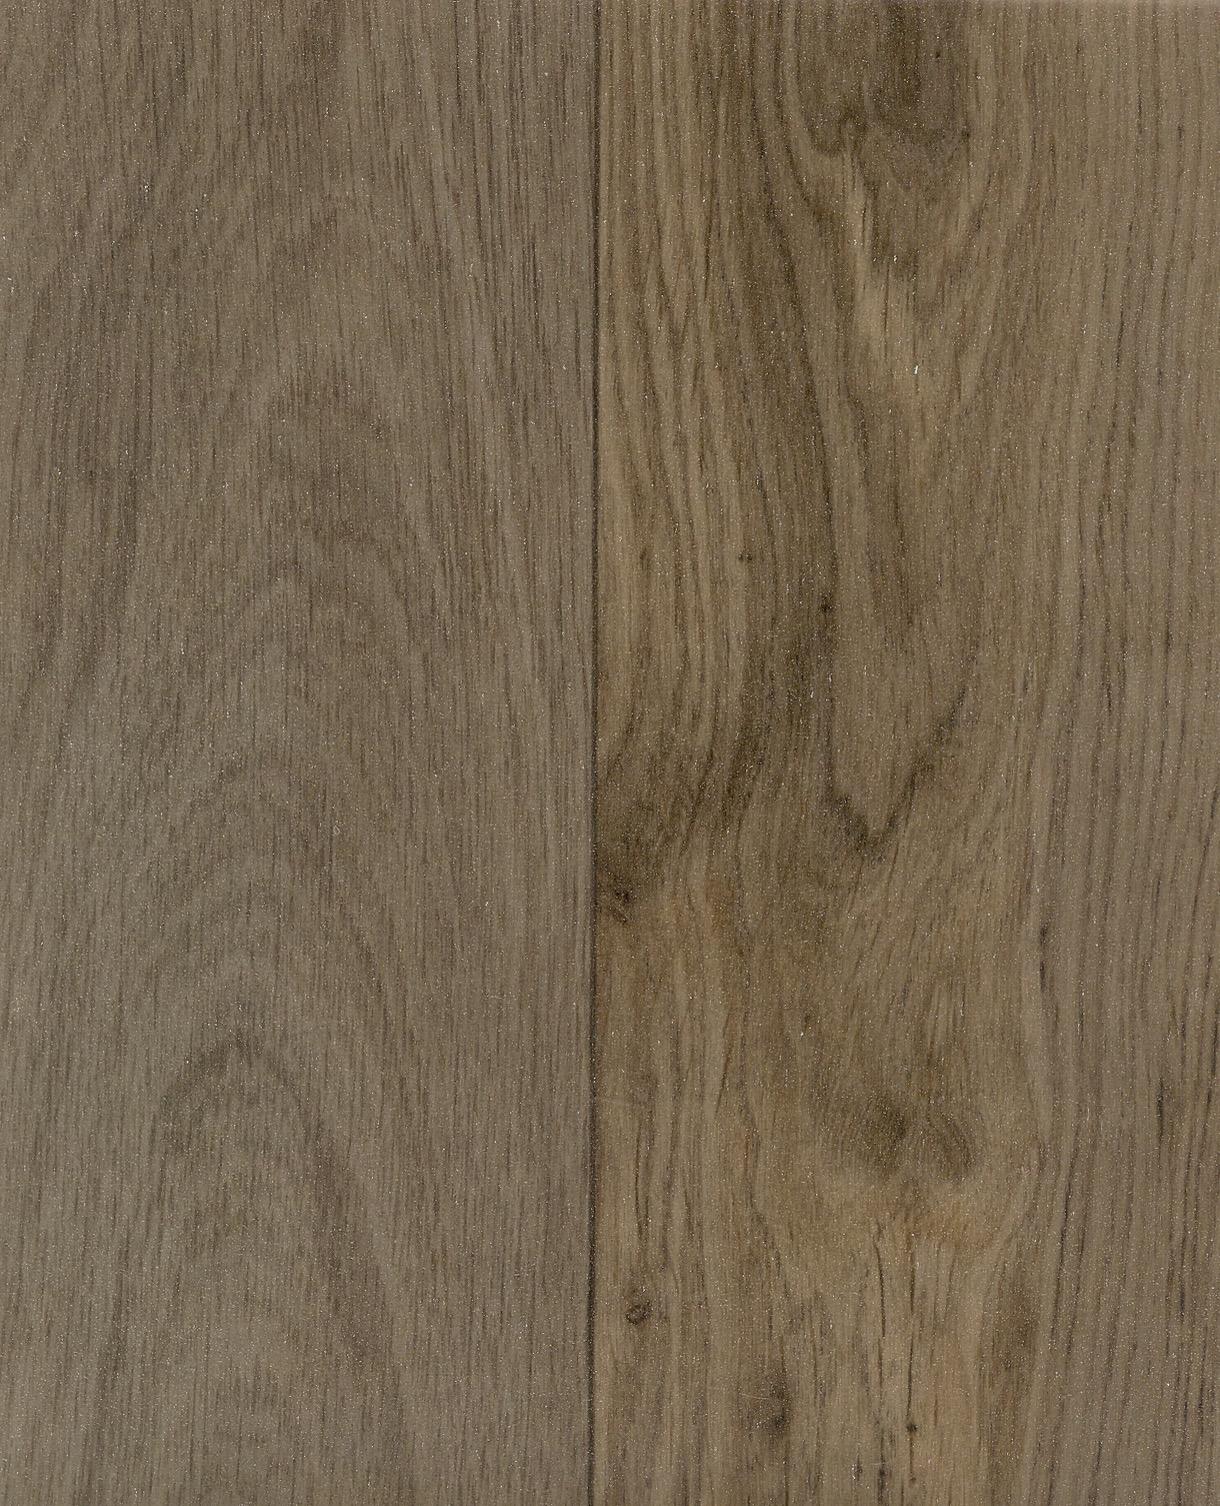 Grabo-Silver-Knight-Wood-Vinyl-Barnwood